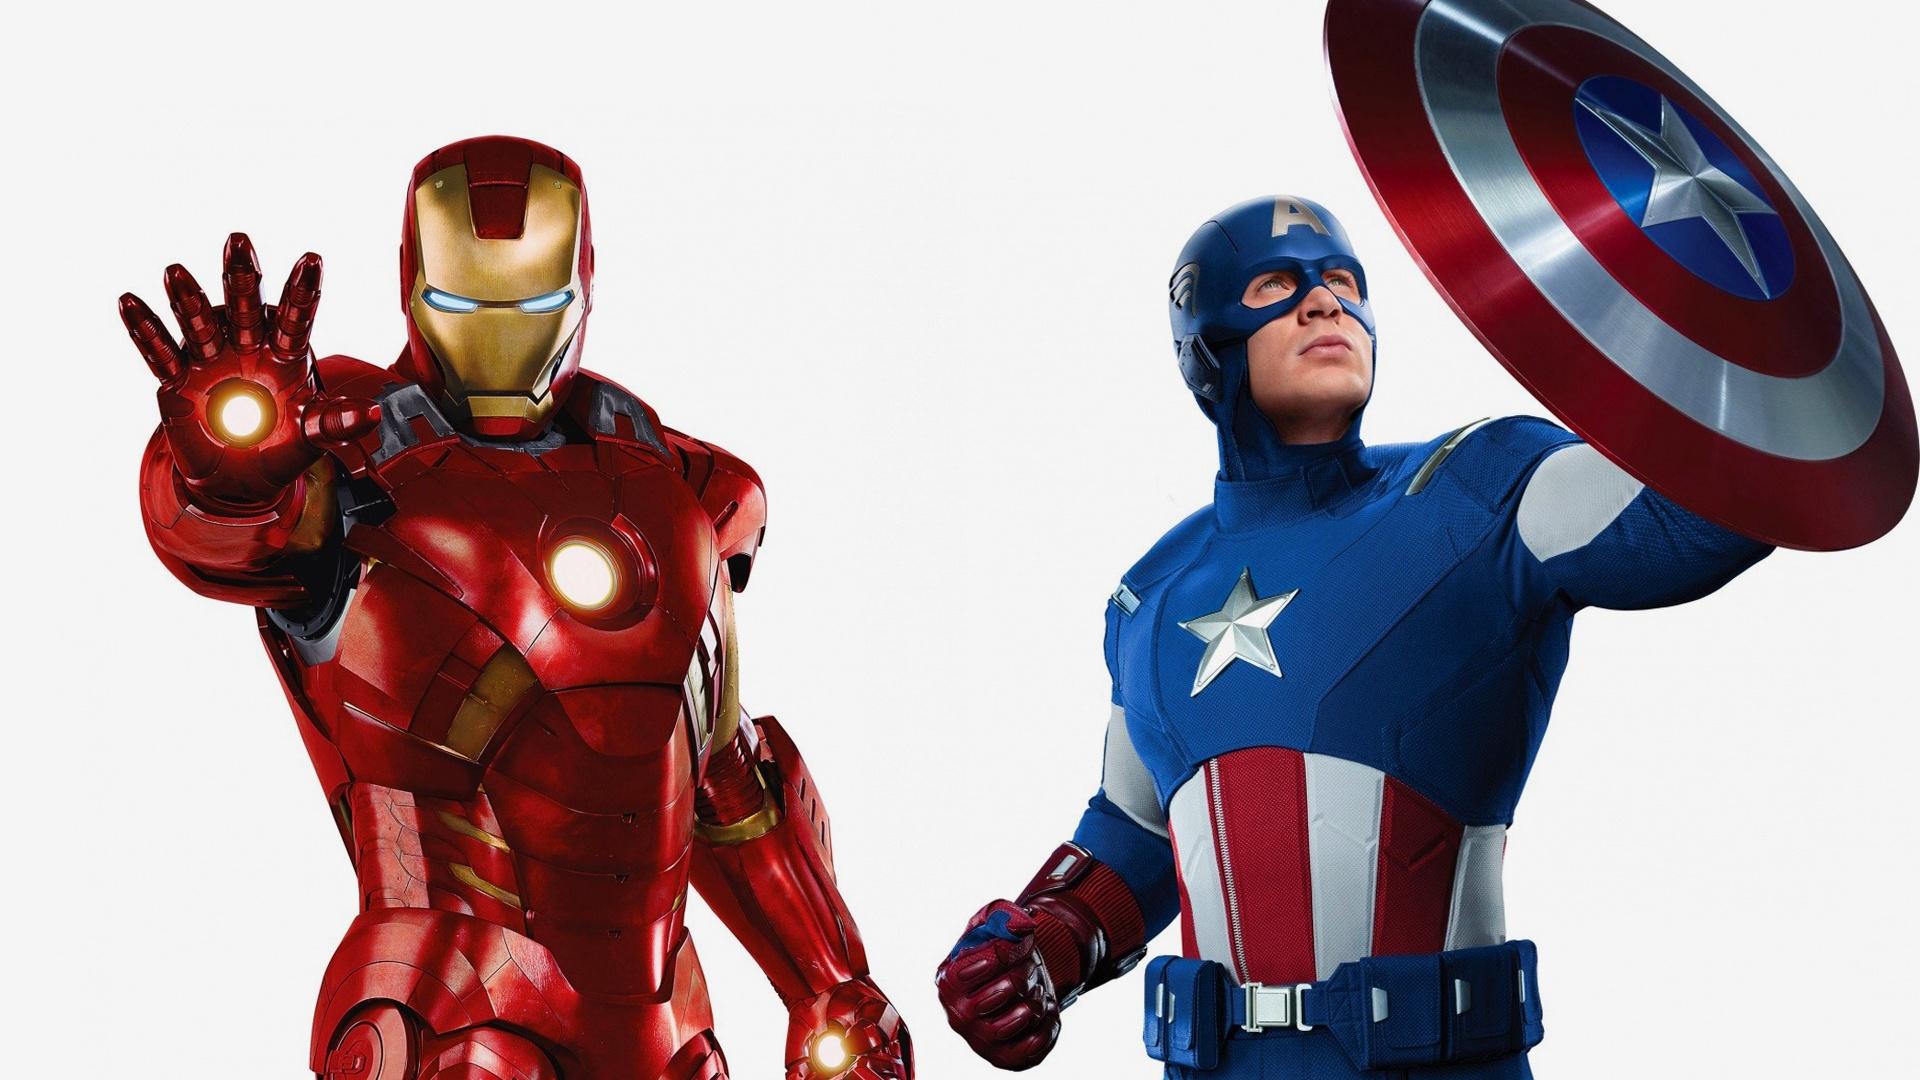 , iron man, captain america fonds d'écran x fonds d'écran